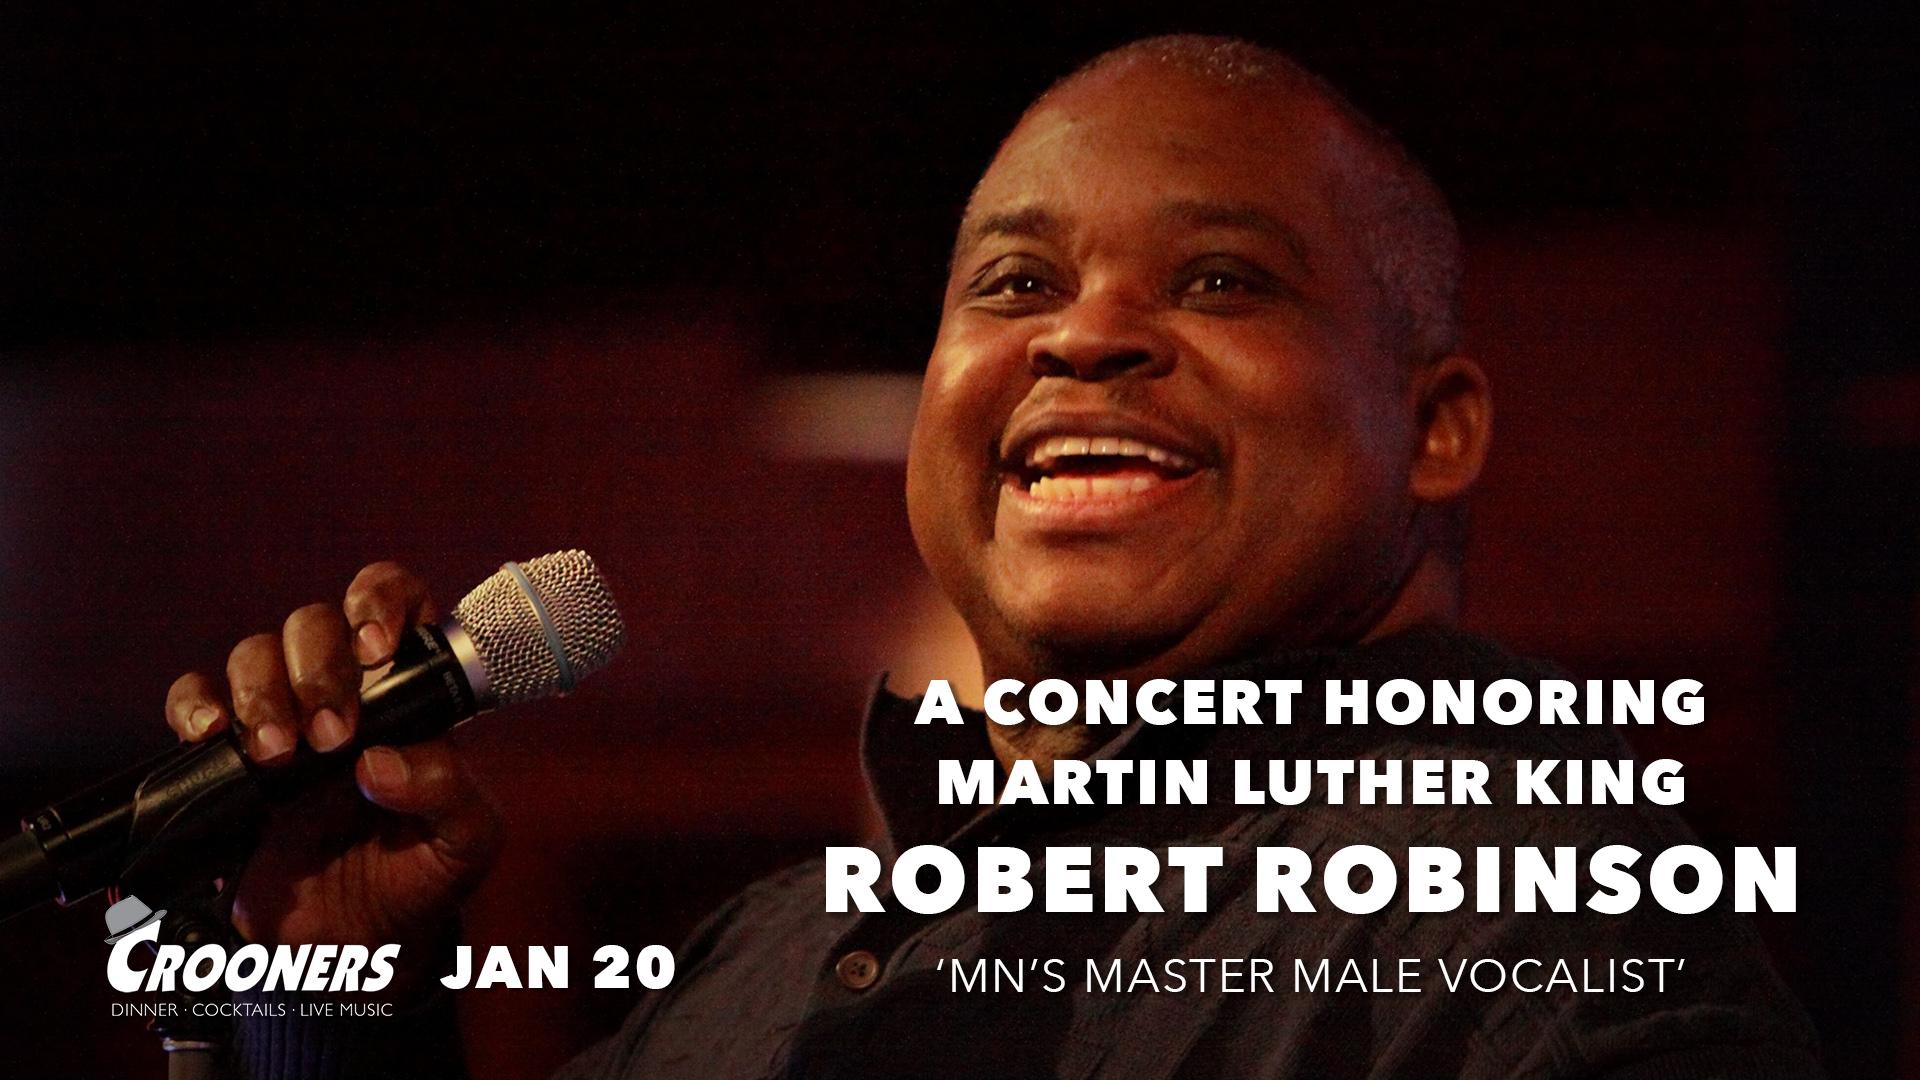 Robert Robinson - A Concert Honoring Martin Luther King Jr.